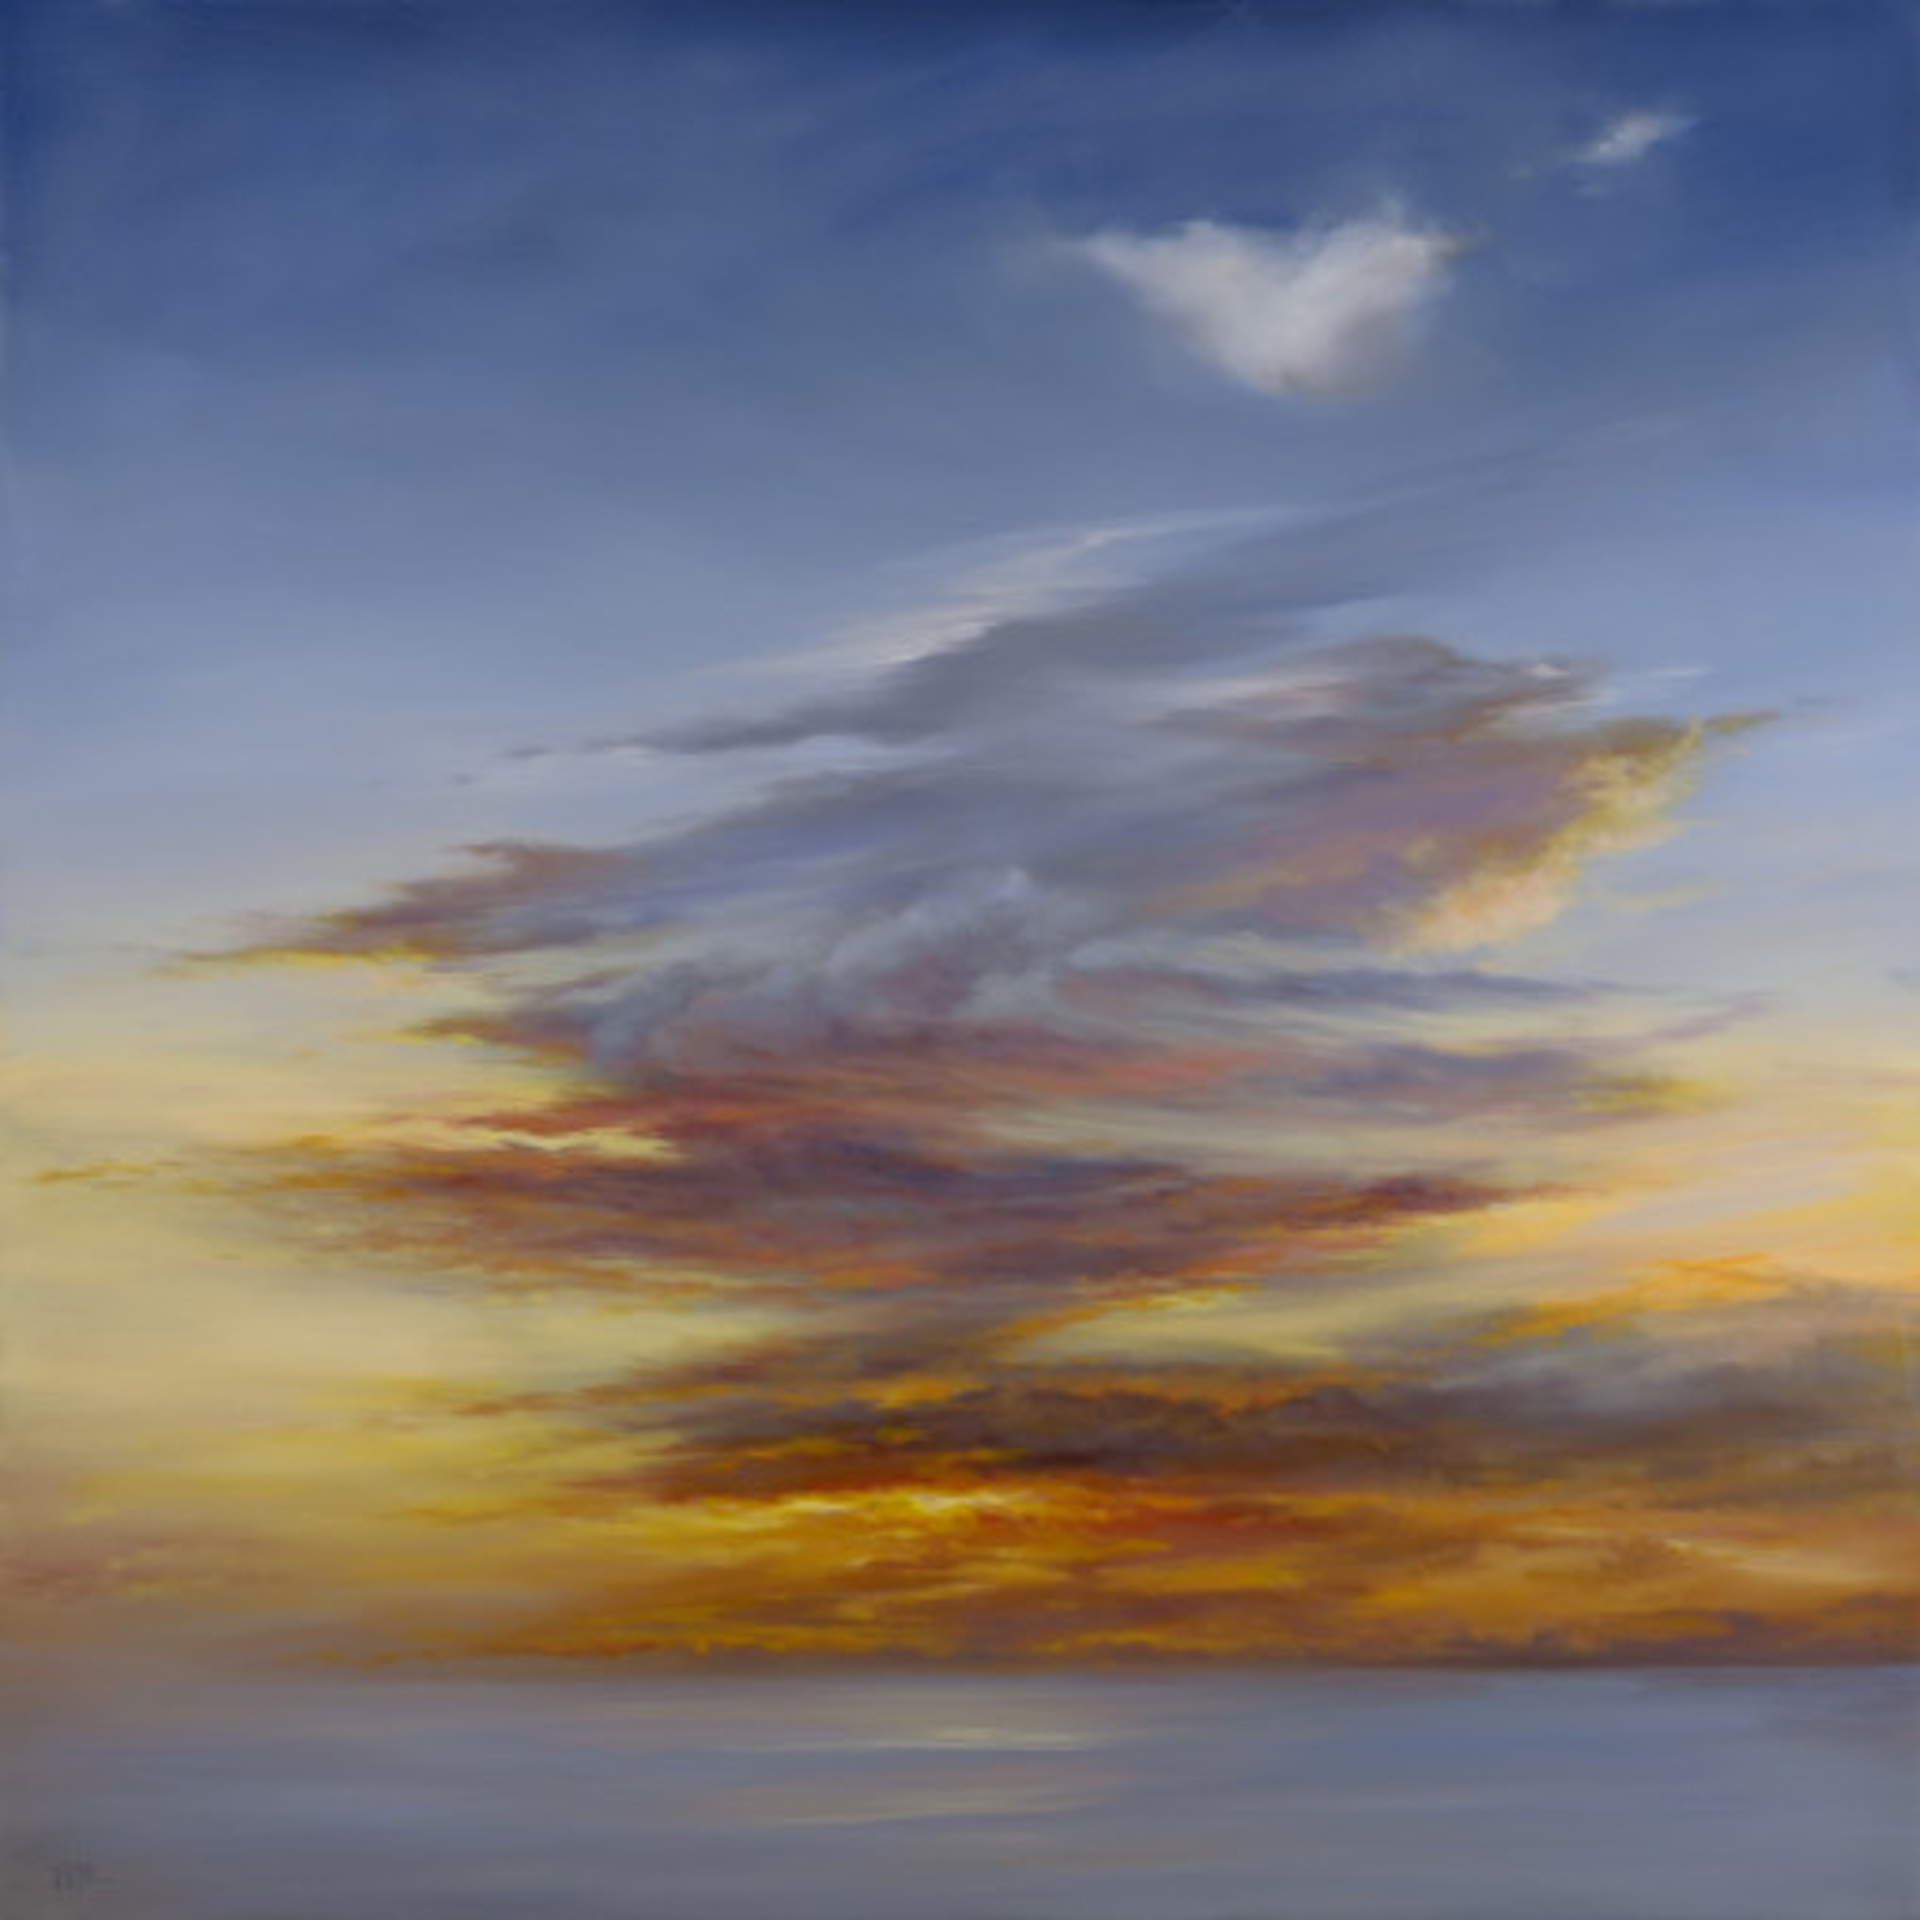 Never Ending by Cheryl Kline